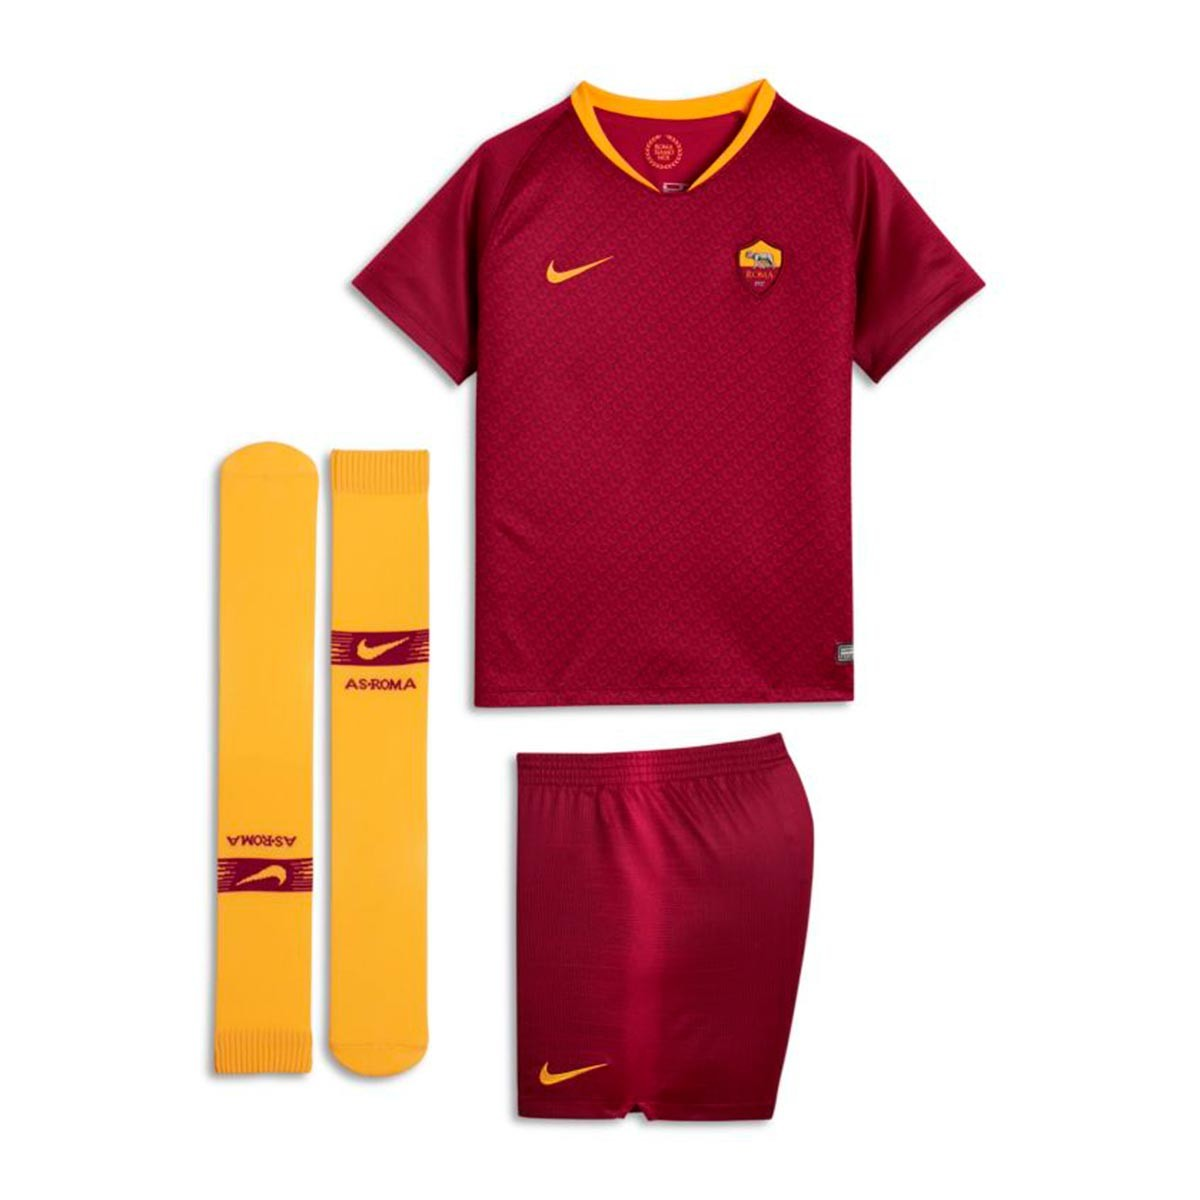 Conjunto Nike AS Roma Primera Equipación 2018-2019 Niño Team red ... 83296eb3f8f61